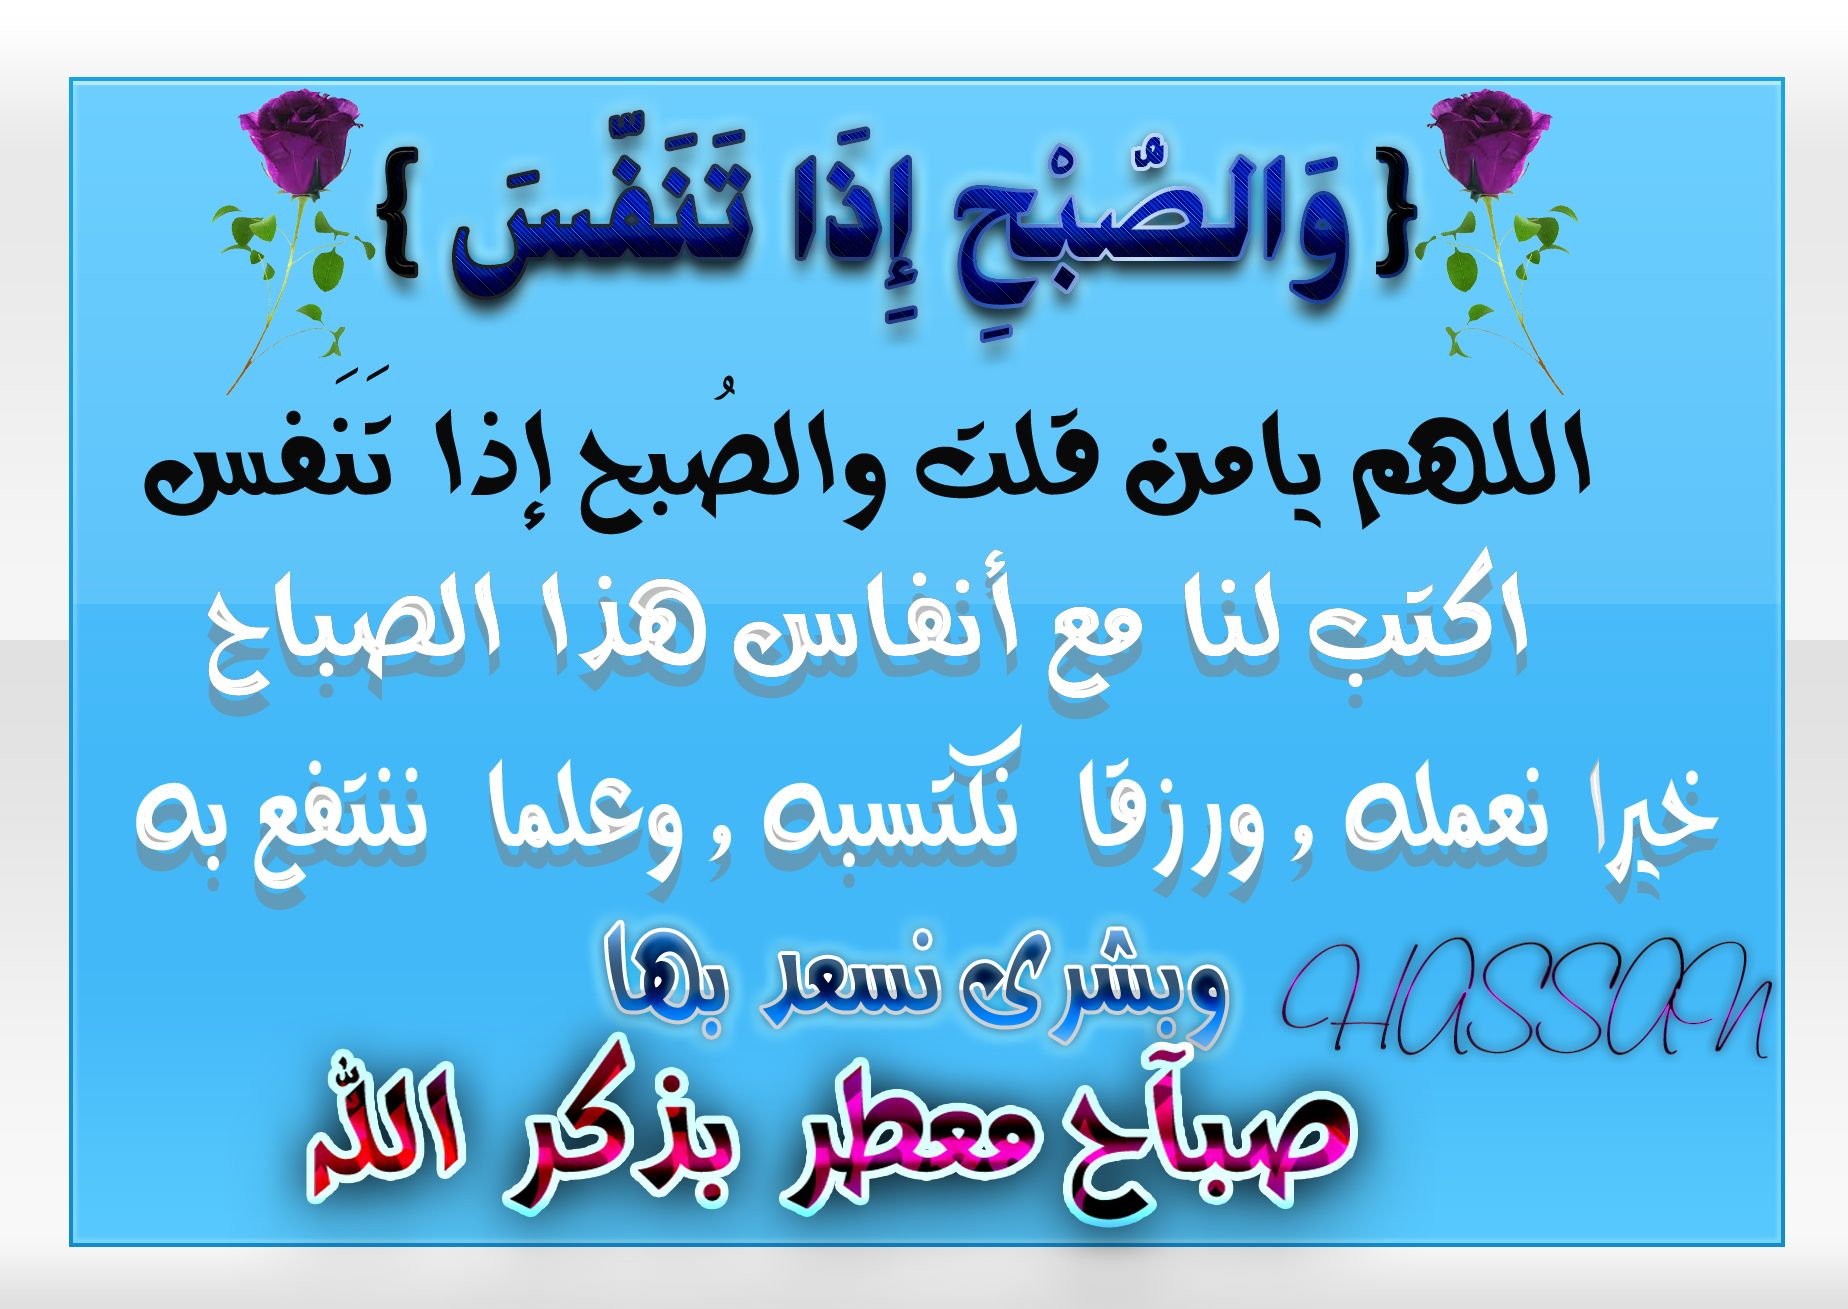 Pin By Noba1020 On والصبح اذا تنفس Arabic Calligraphy Alae Calligraphy